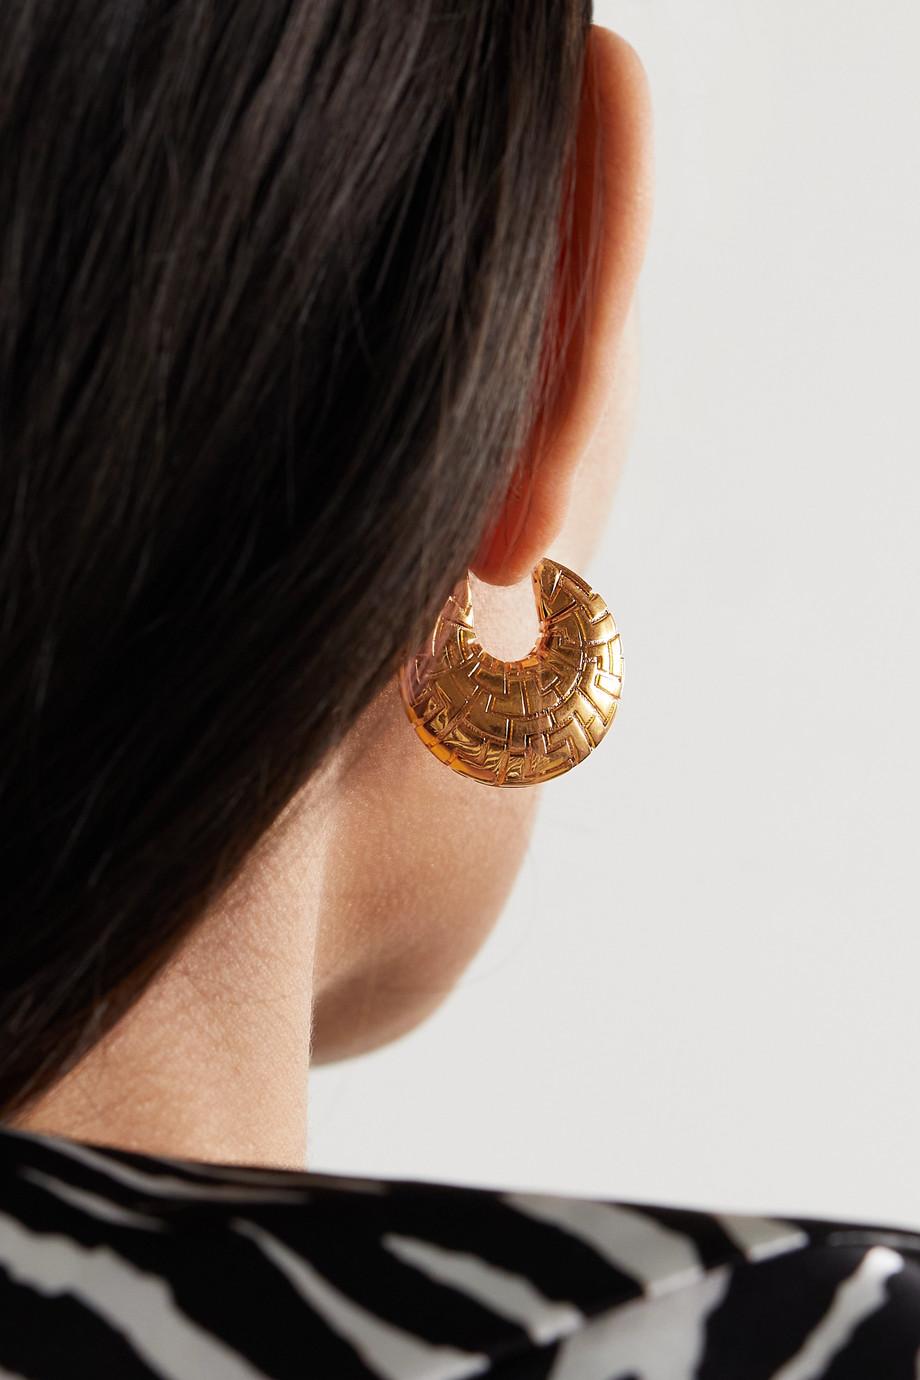 Leda Madera Boucles d'oreilles en plaqué or Geena